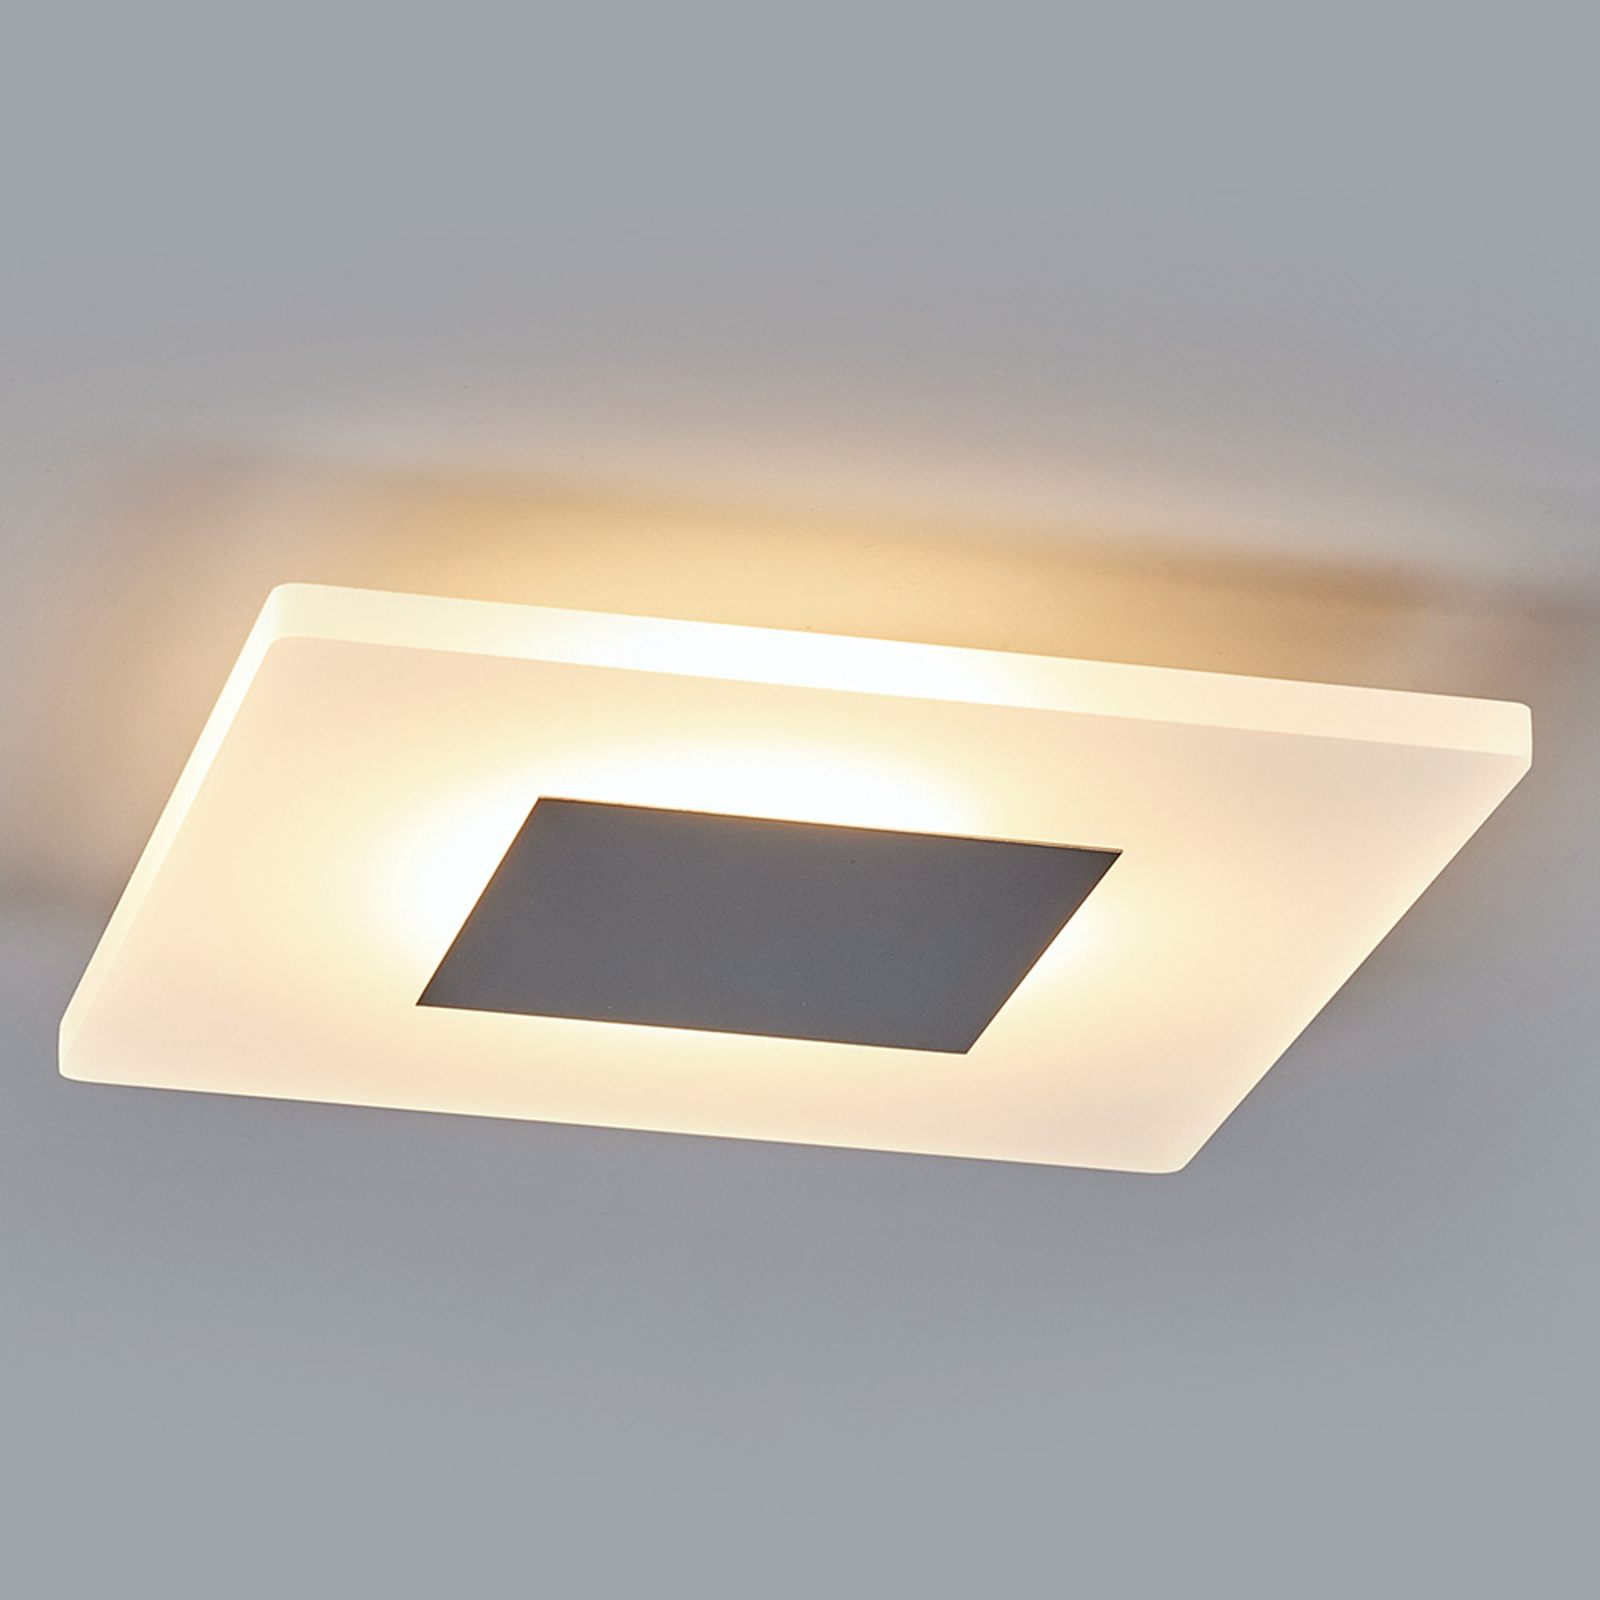 Tarja - kantet LED-taklampe